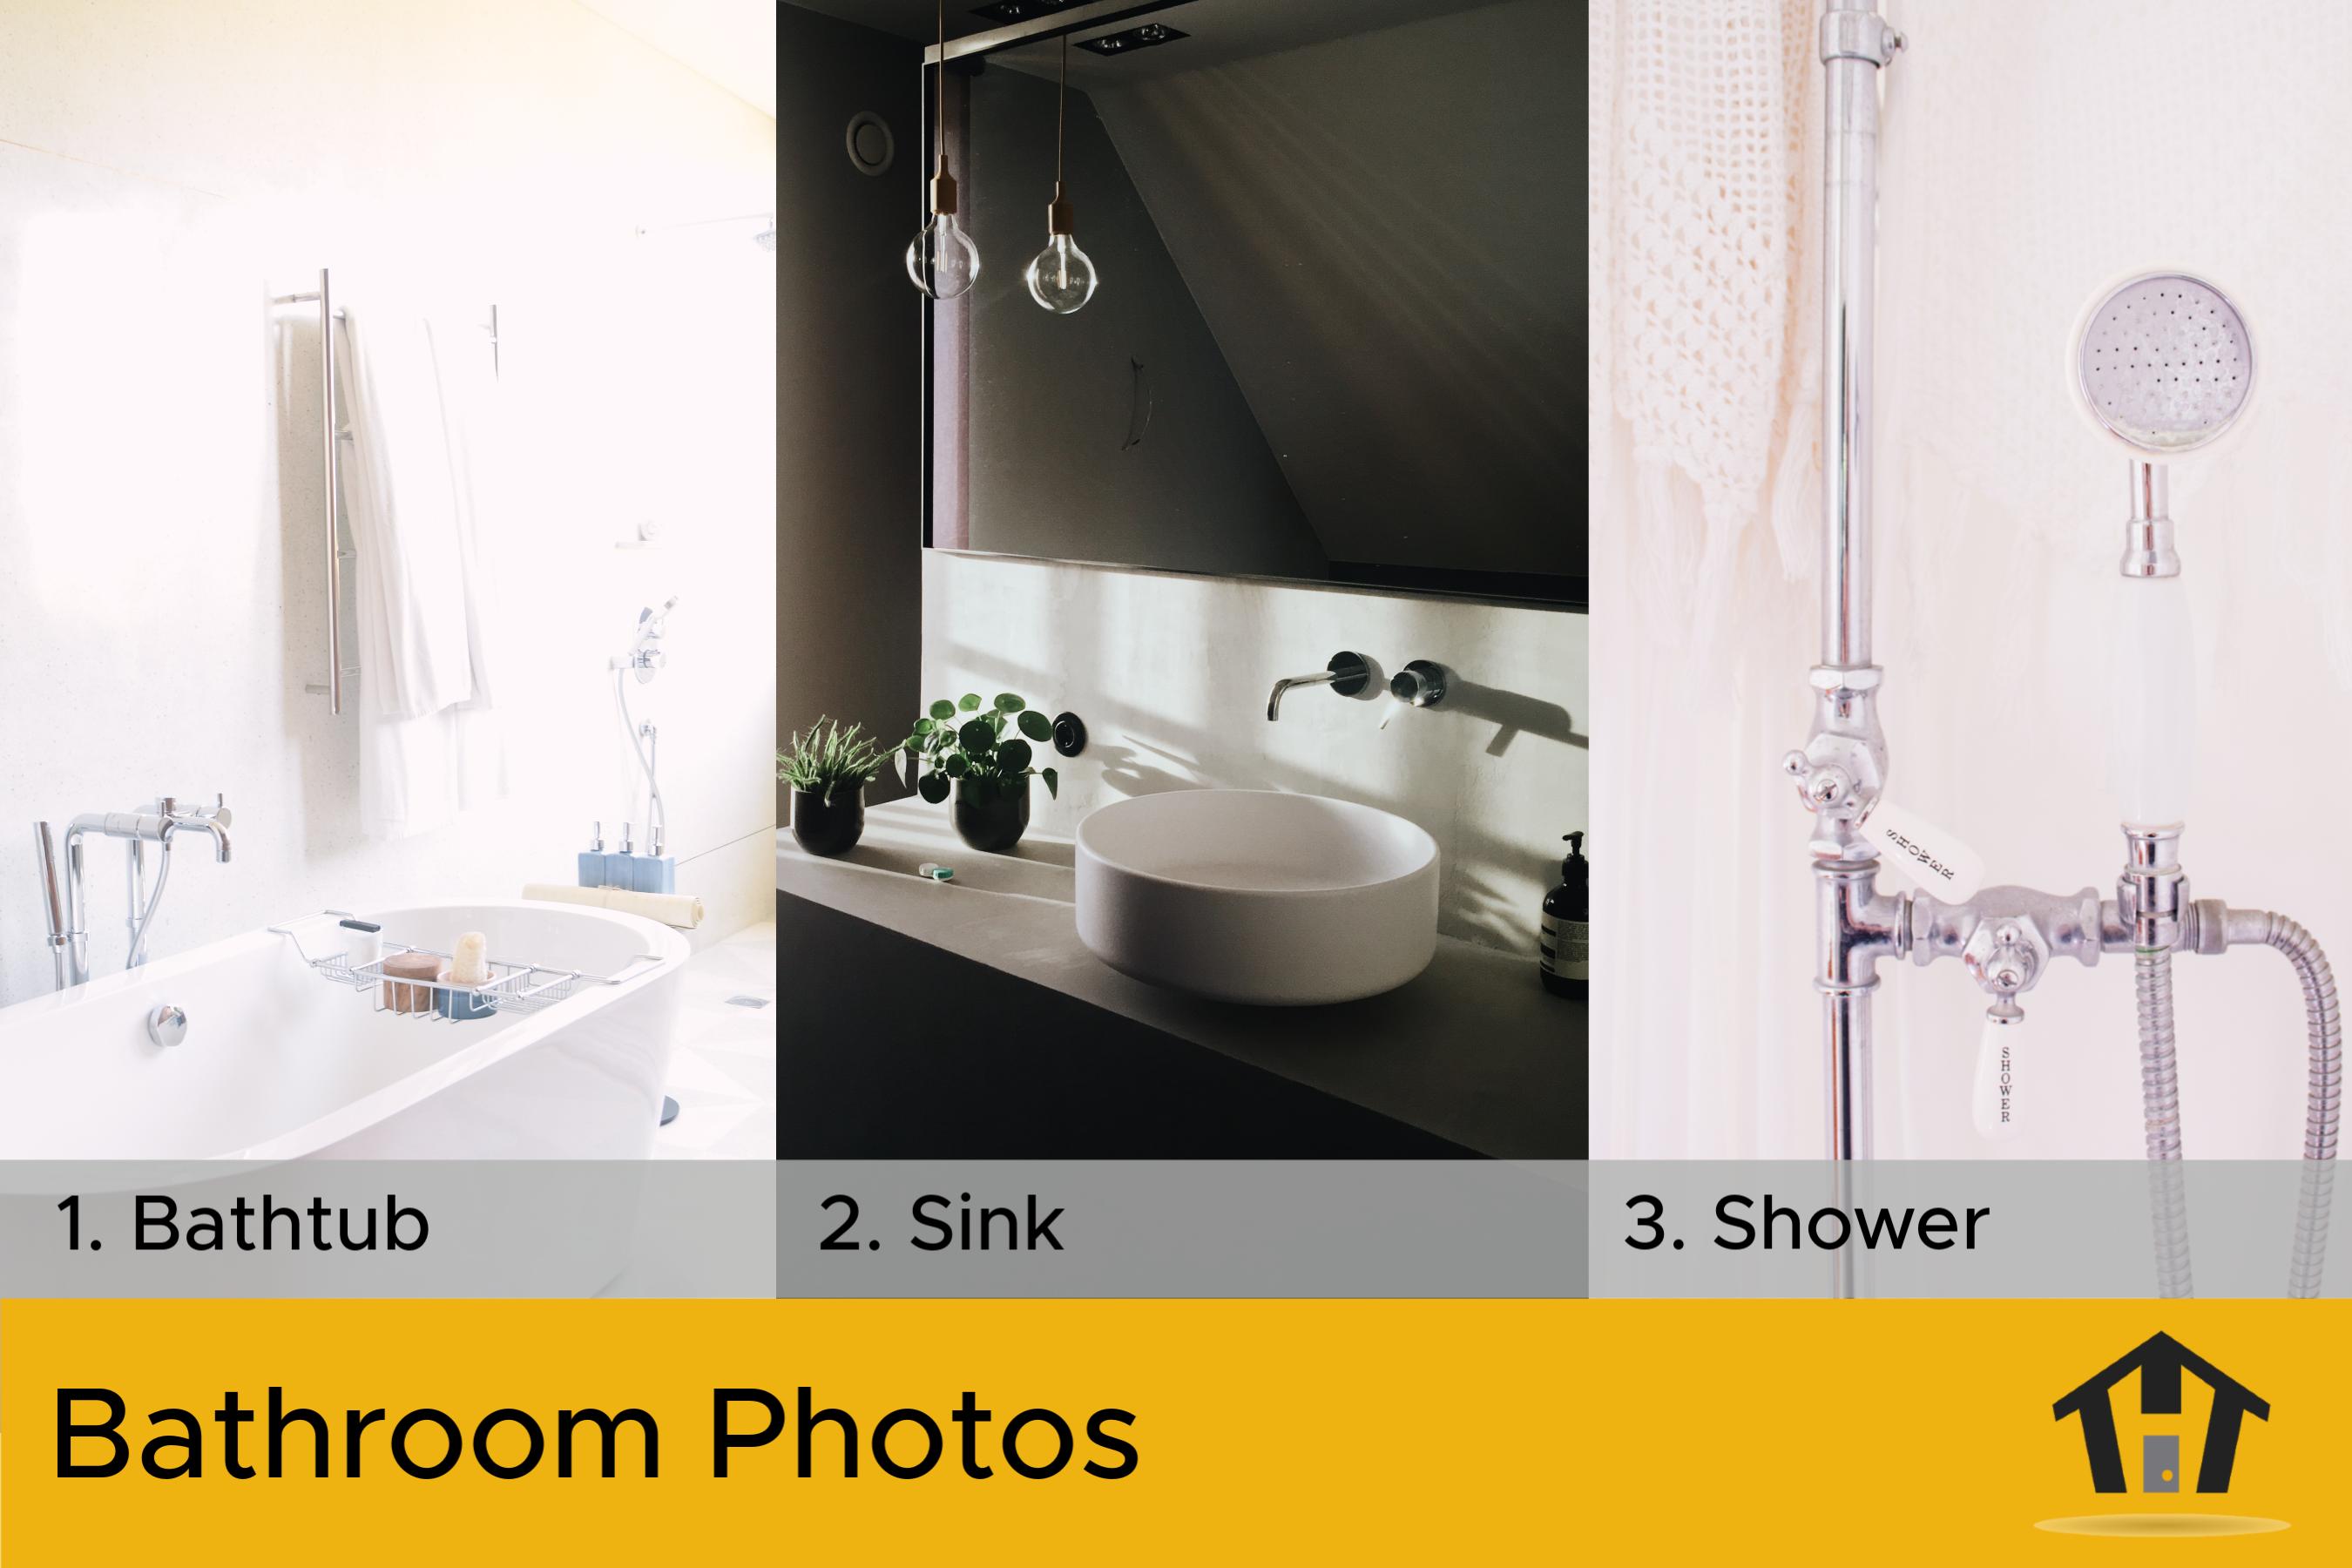 Bathroom Photos - The Self-Inspect Program